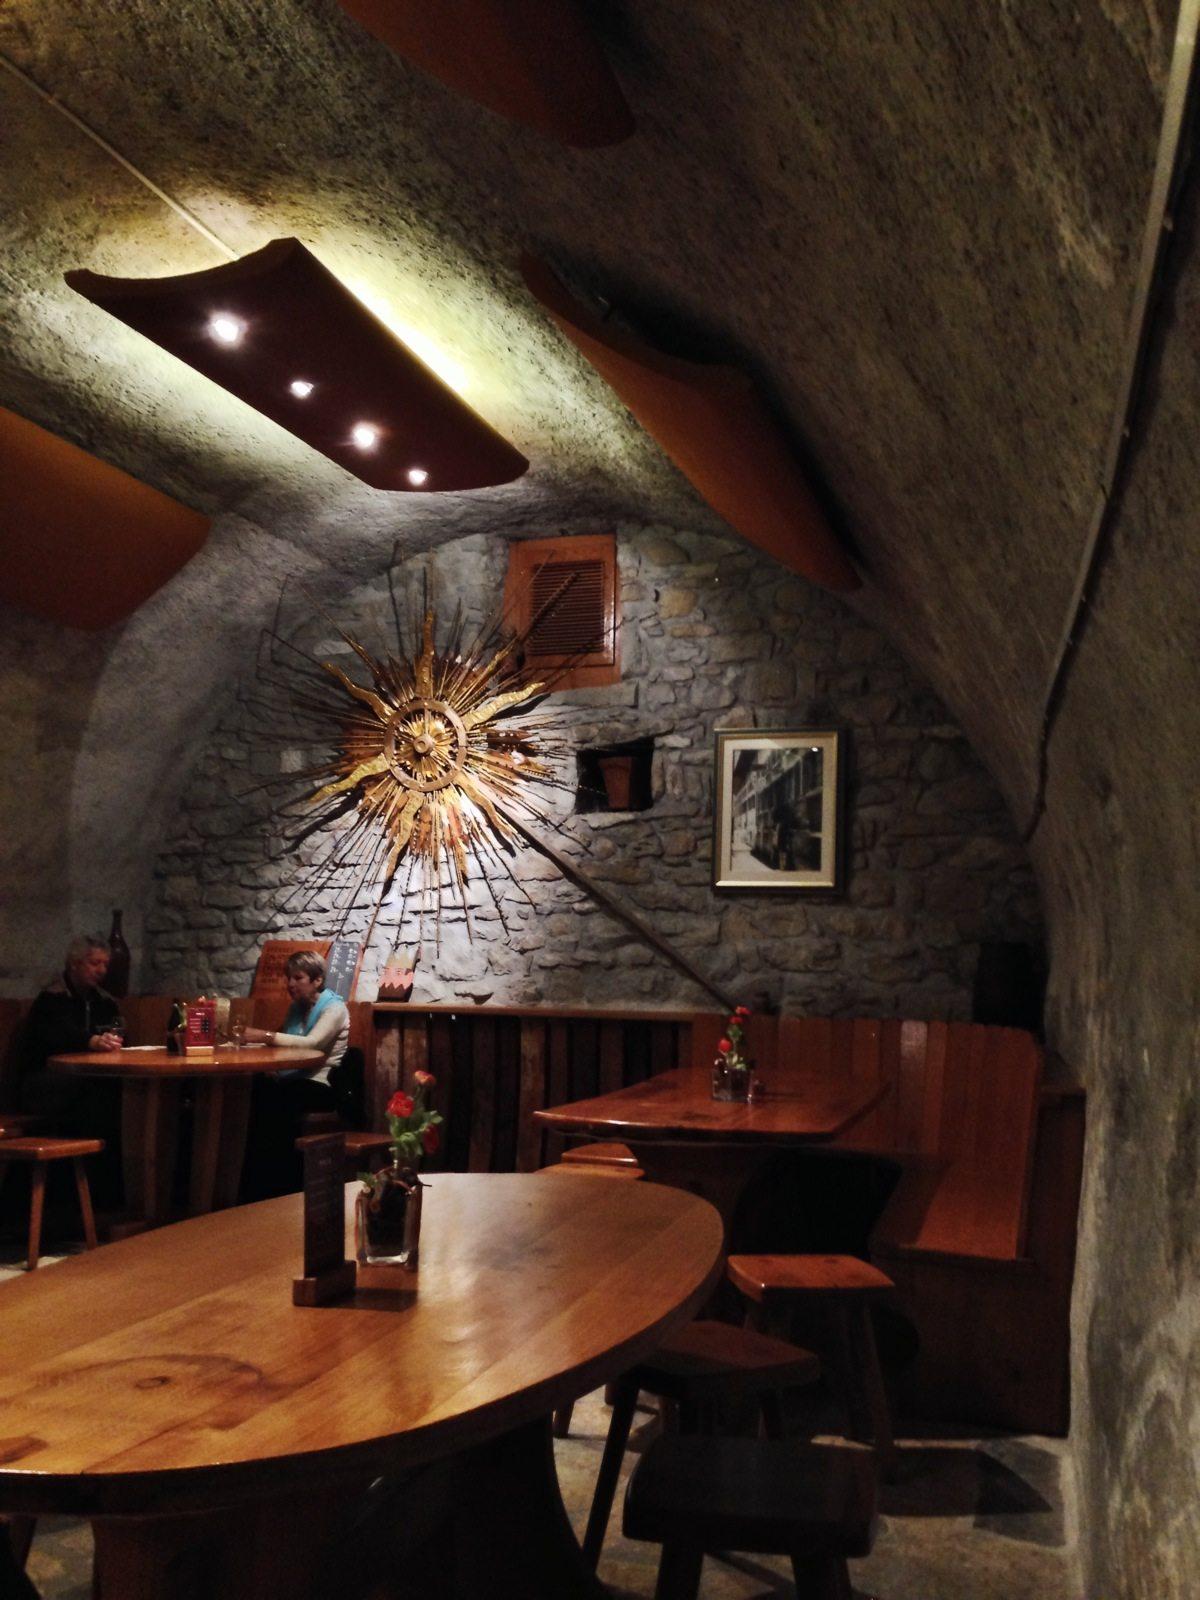 Inside the wine bar